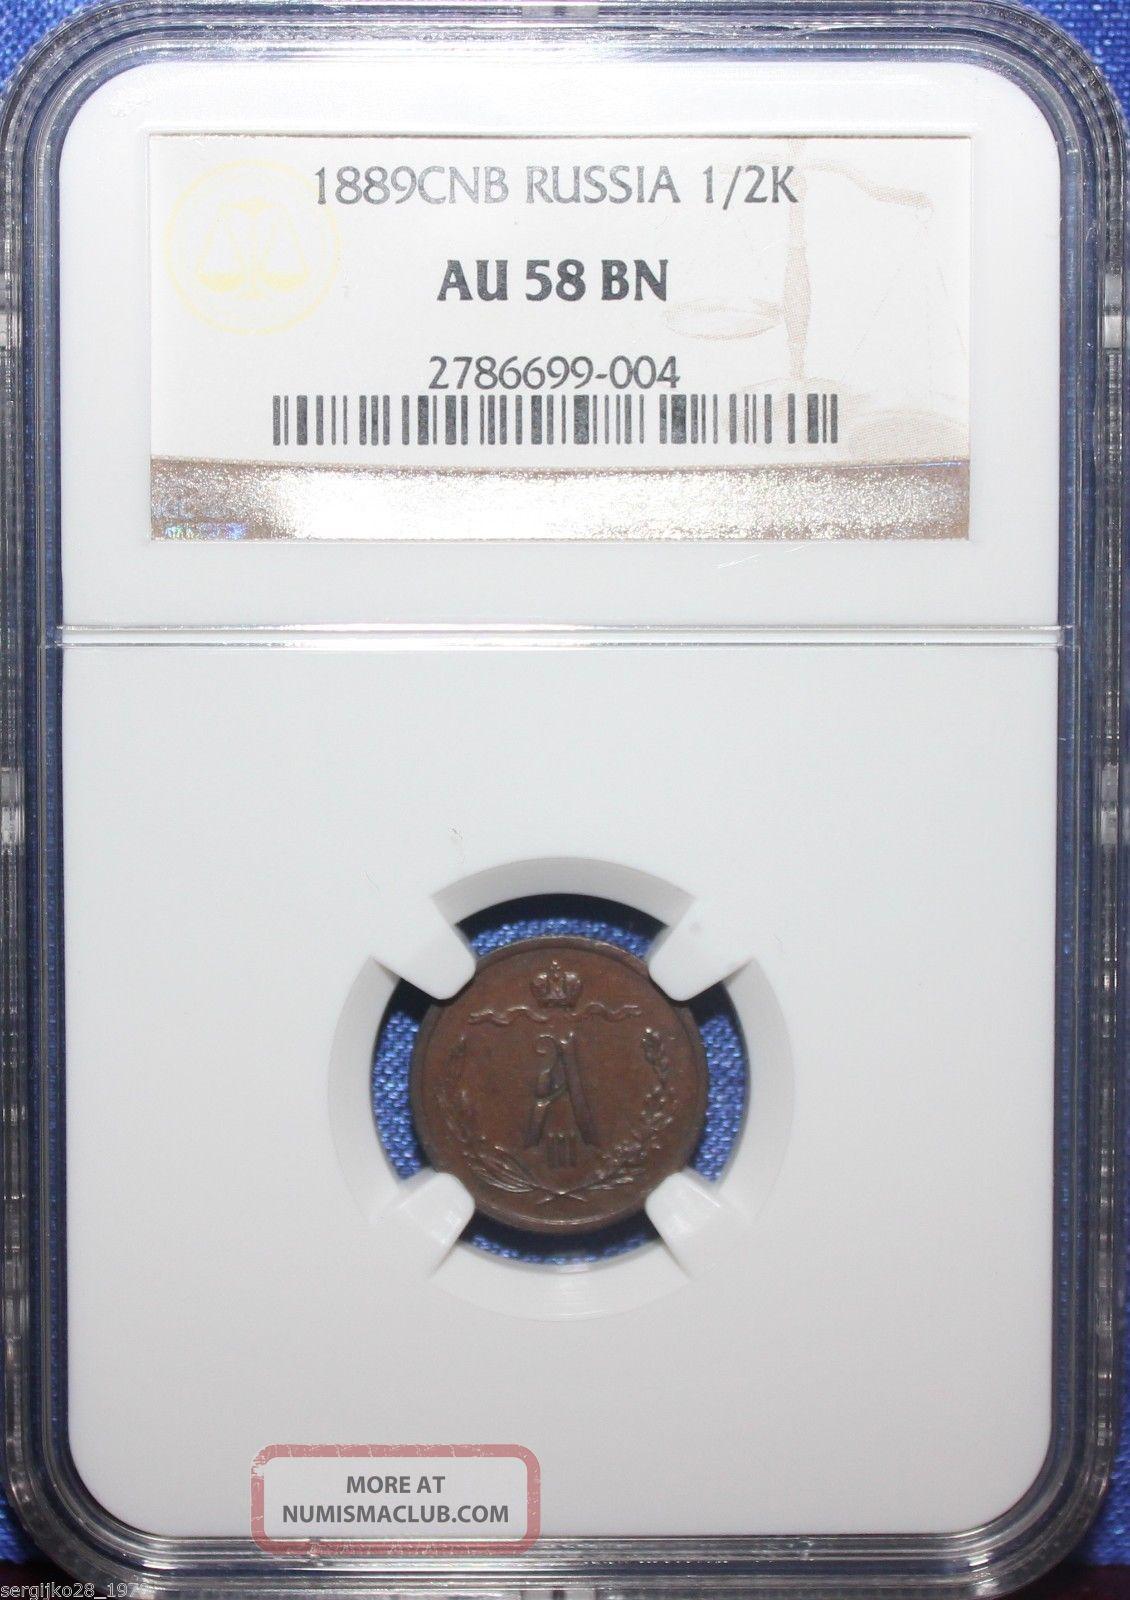 Russia 1/2 Kopek 1889 Ngc Au58bn Alexander Iii Coin Russia photo